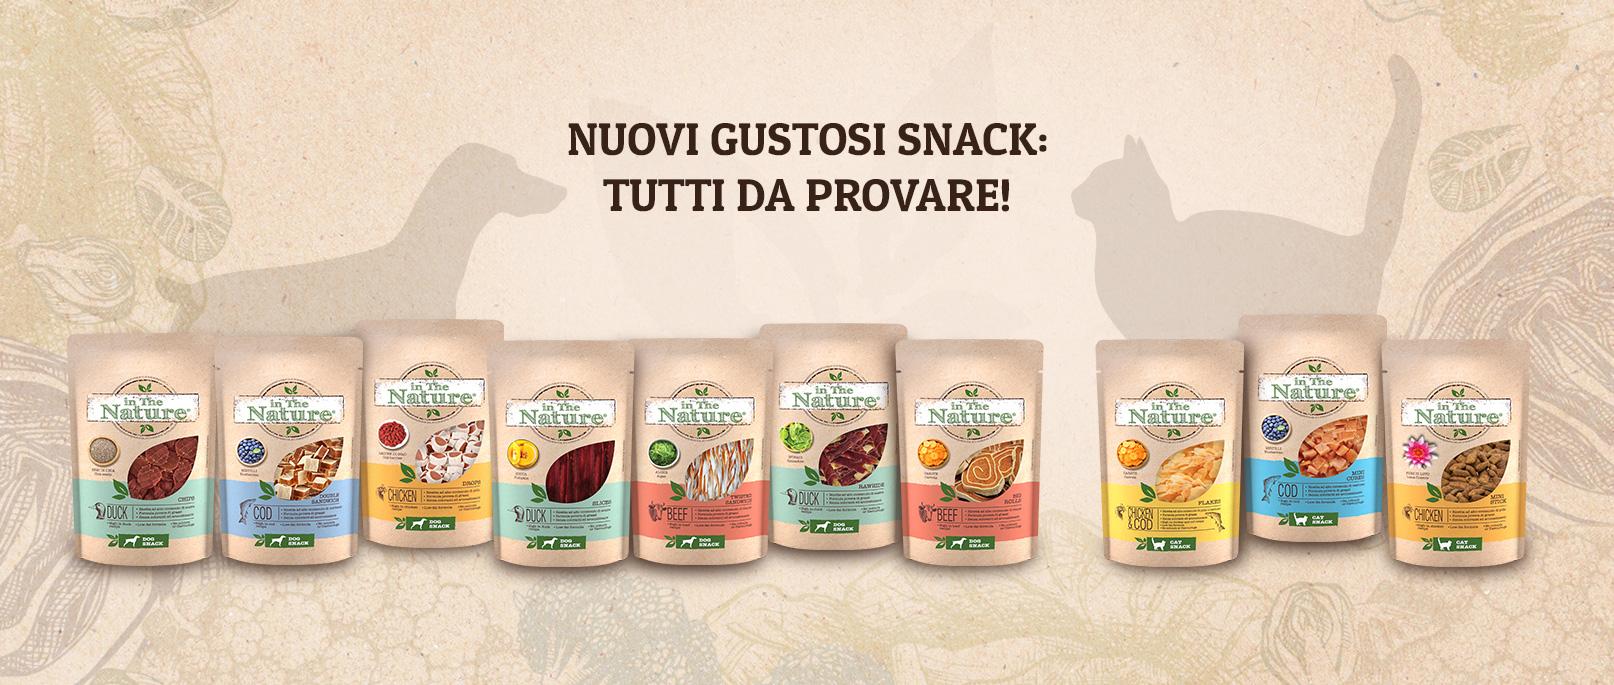 Nuovi gustosi snack In The Nature®